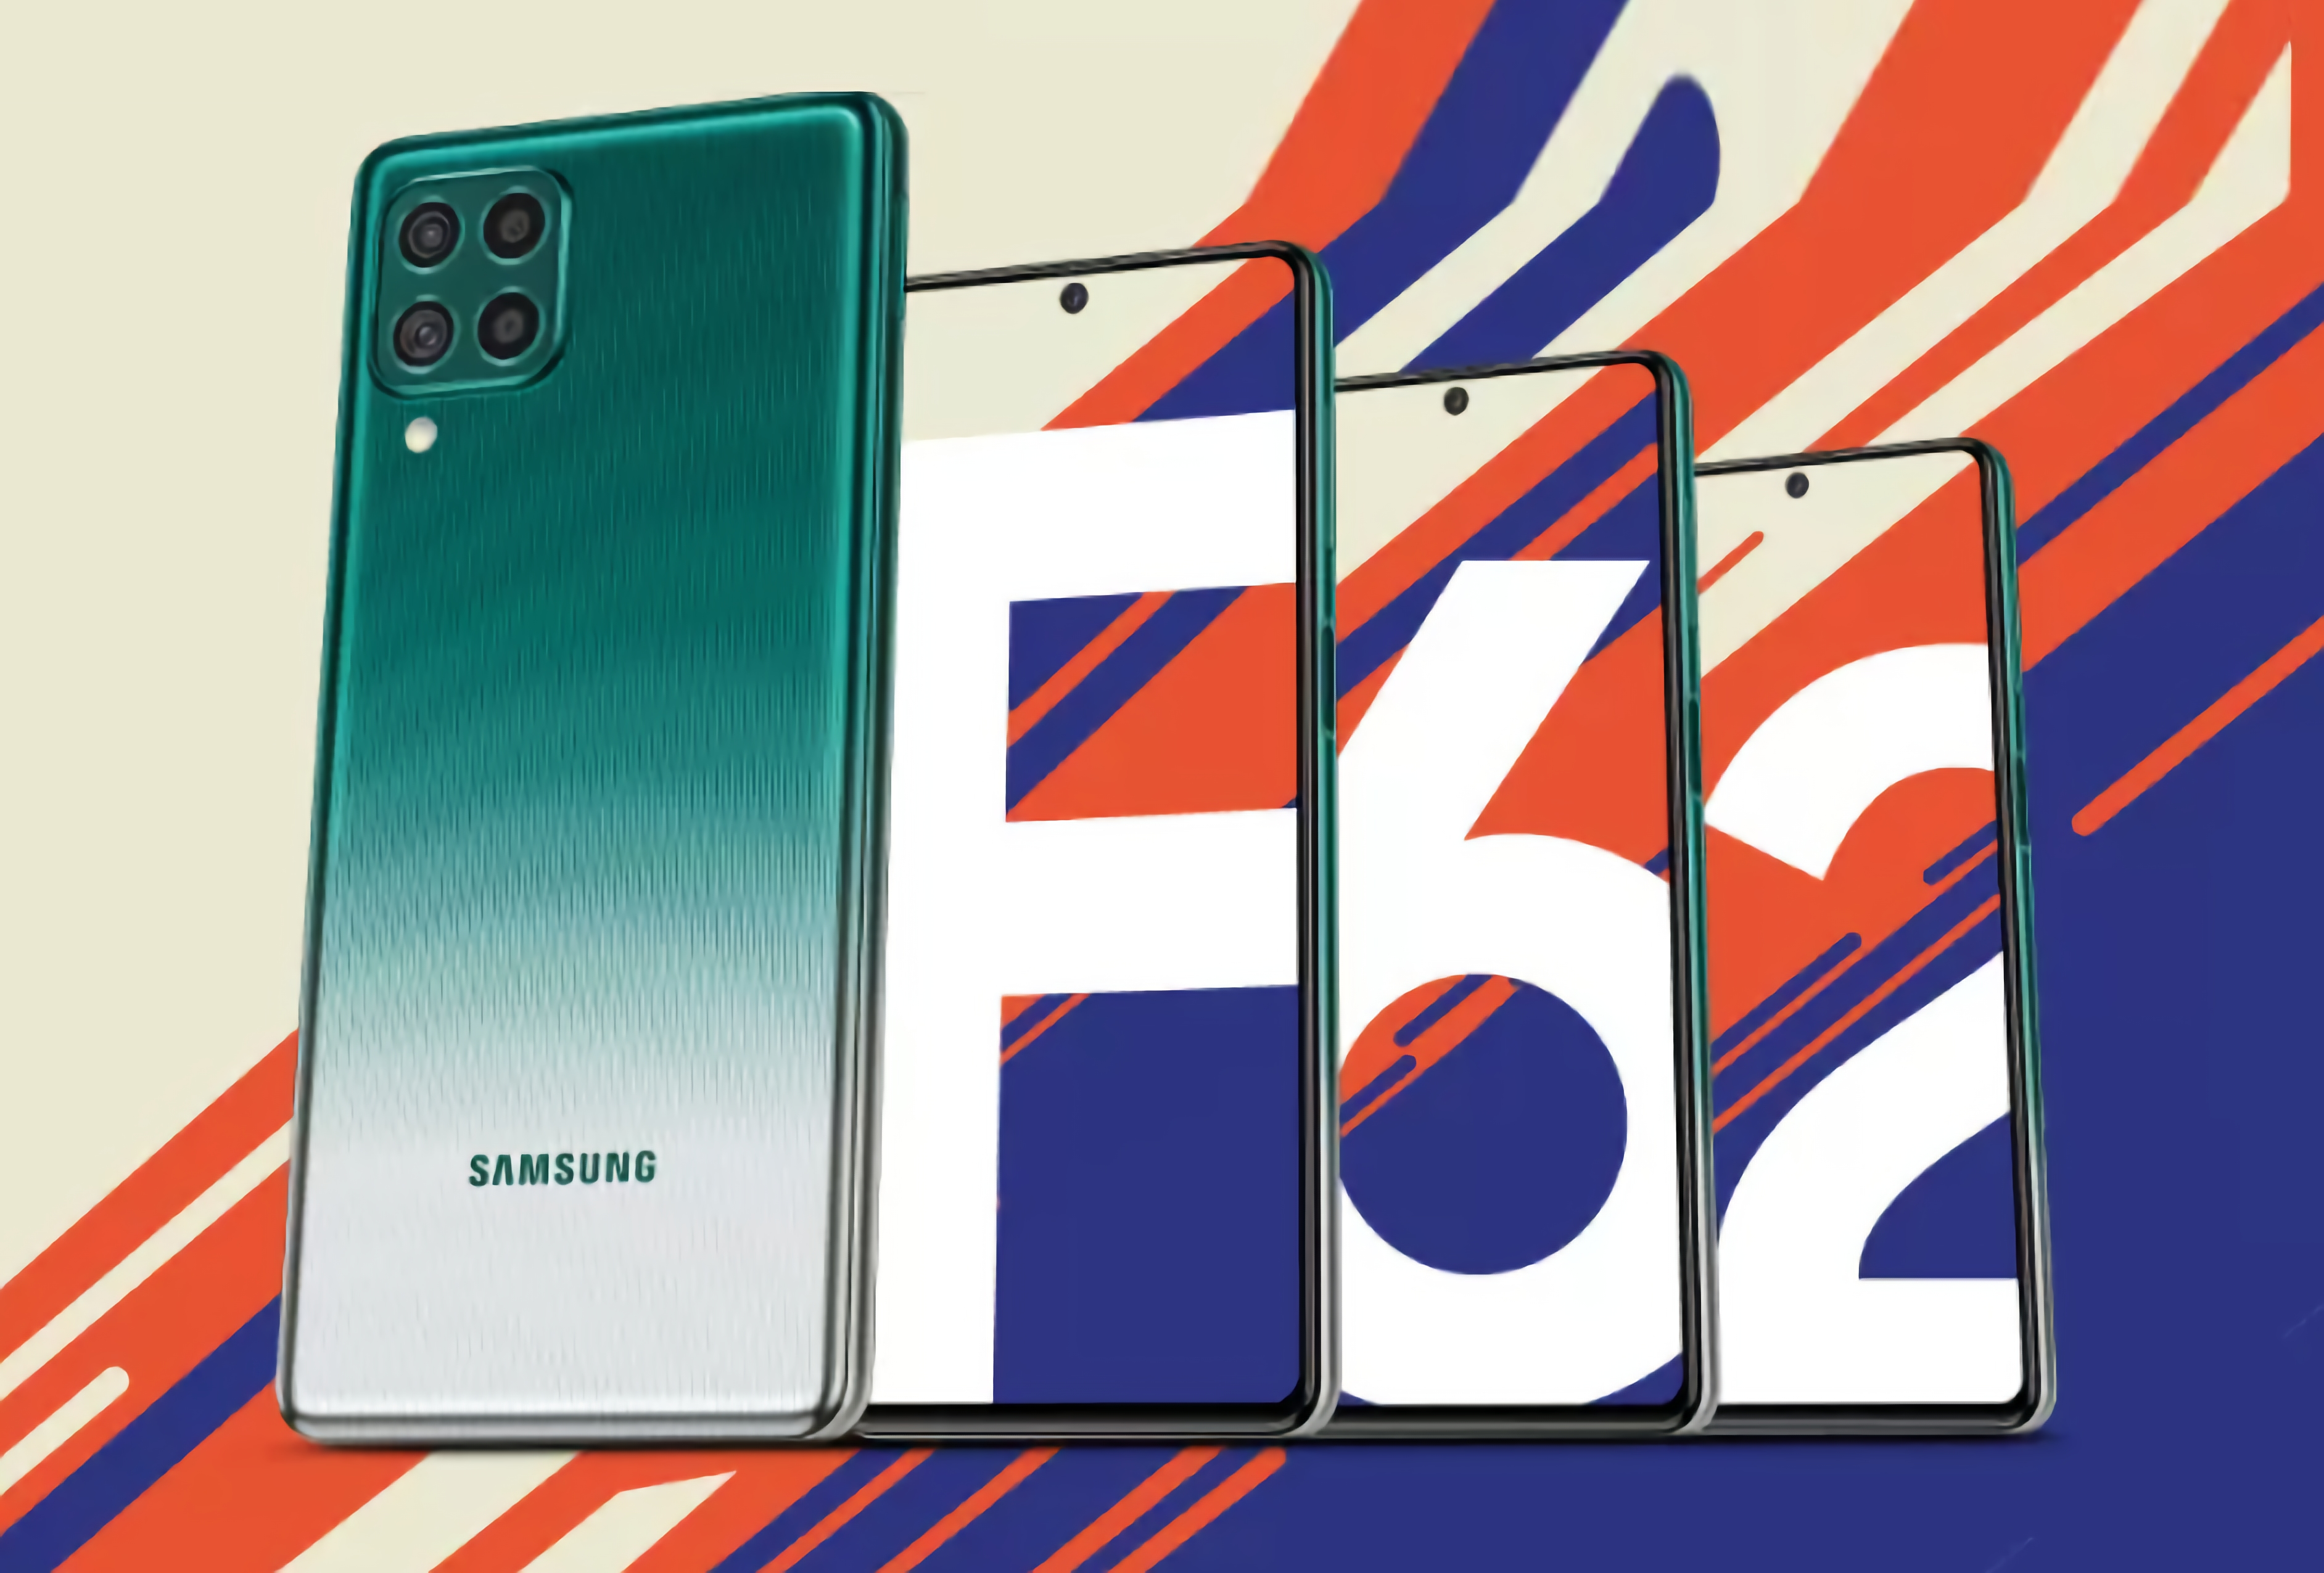 Samsung Galaxy F62: AMOLED-дисплей, чип как у Galaxy Note 10, квадро-камера на 64 МП, батарея на 7000 мАч и ценник от $330